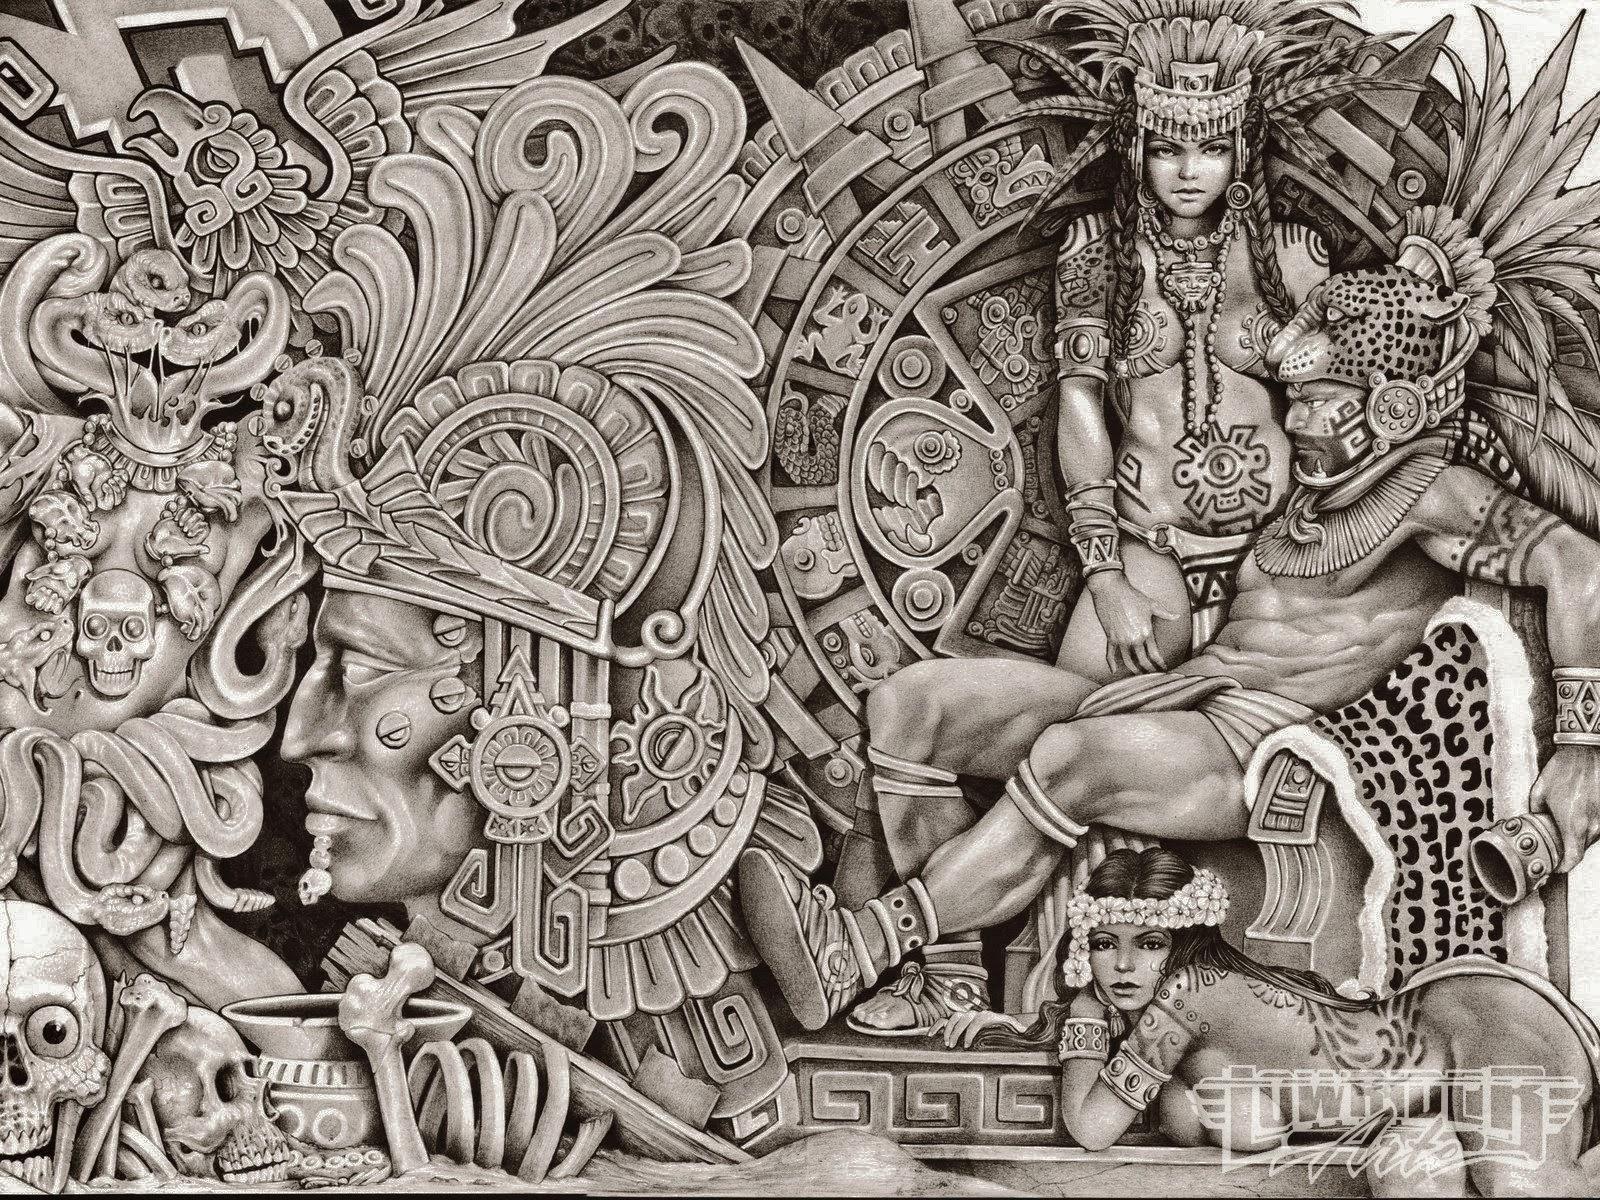 1600x1200 Lowrider Arte Aztec Drawings Pro Status Low Rider Art